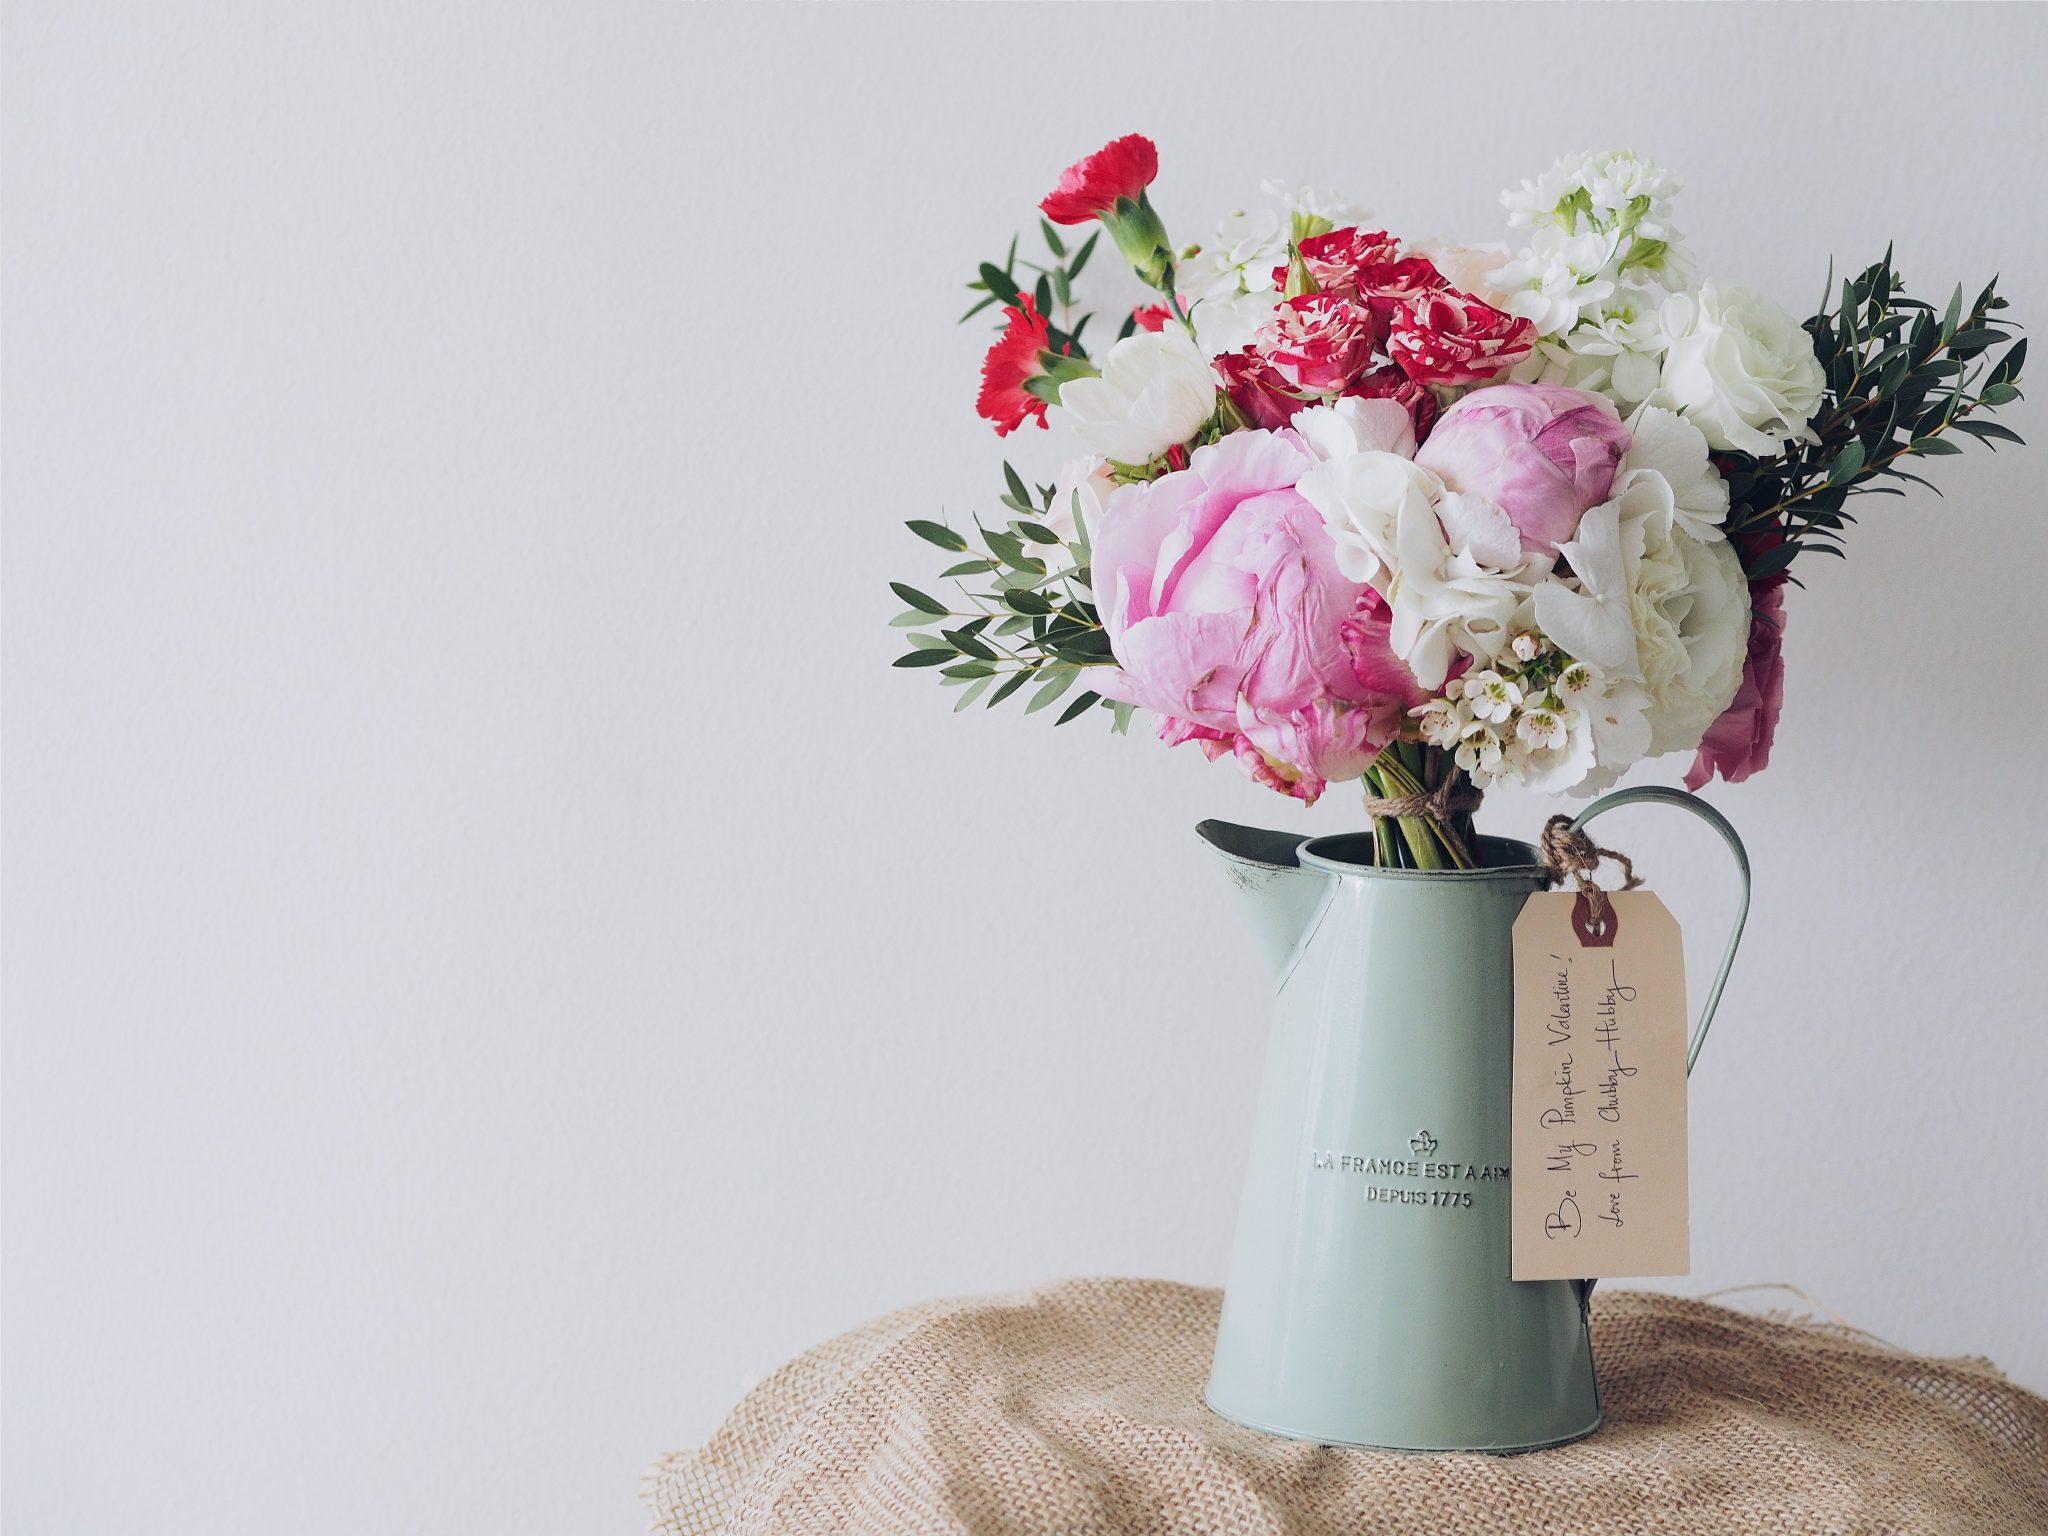 Your Peach Blossom stars: how to take advantage?